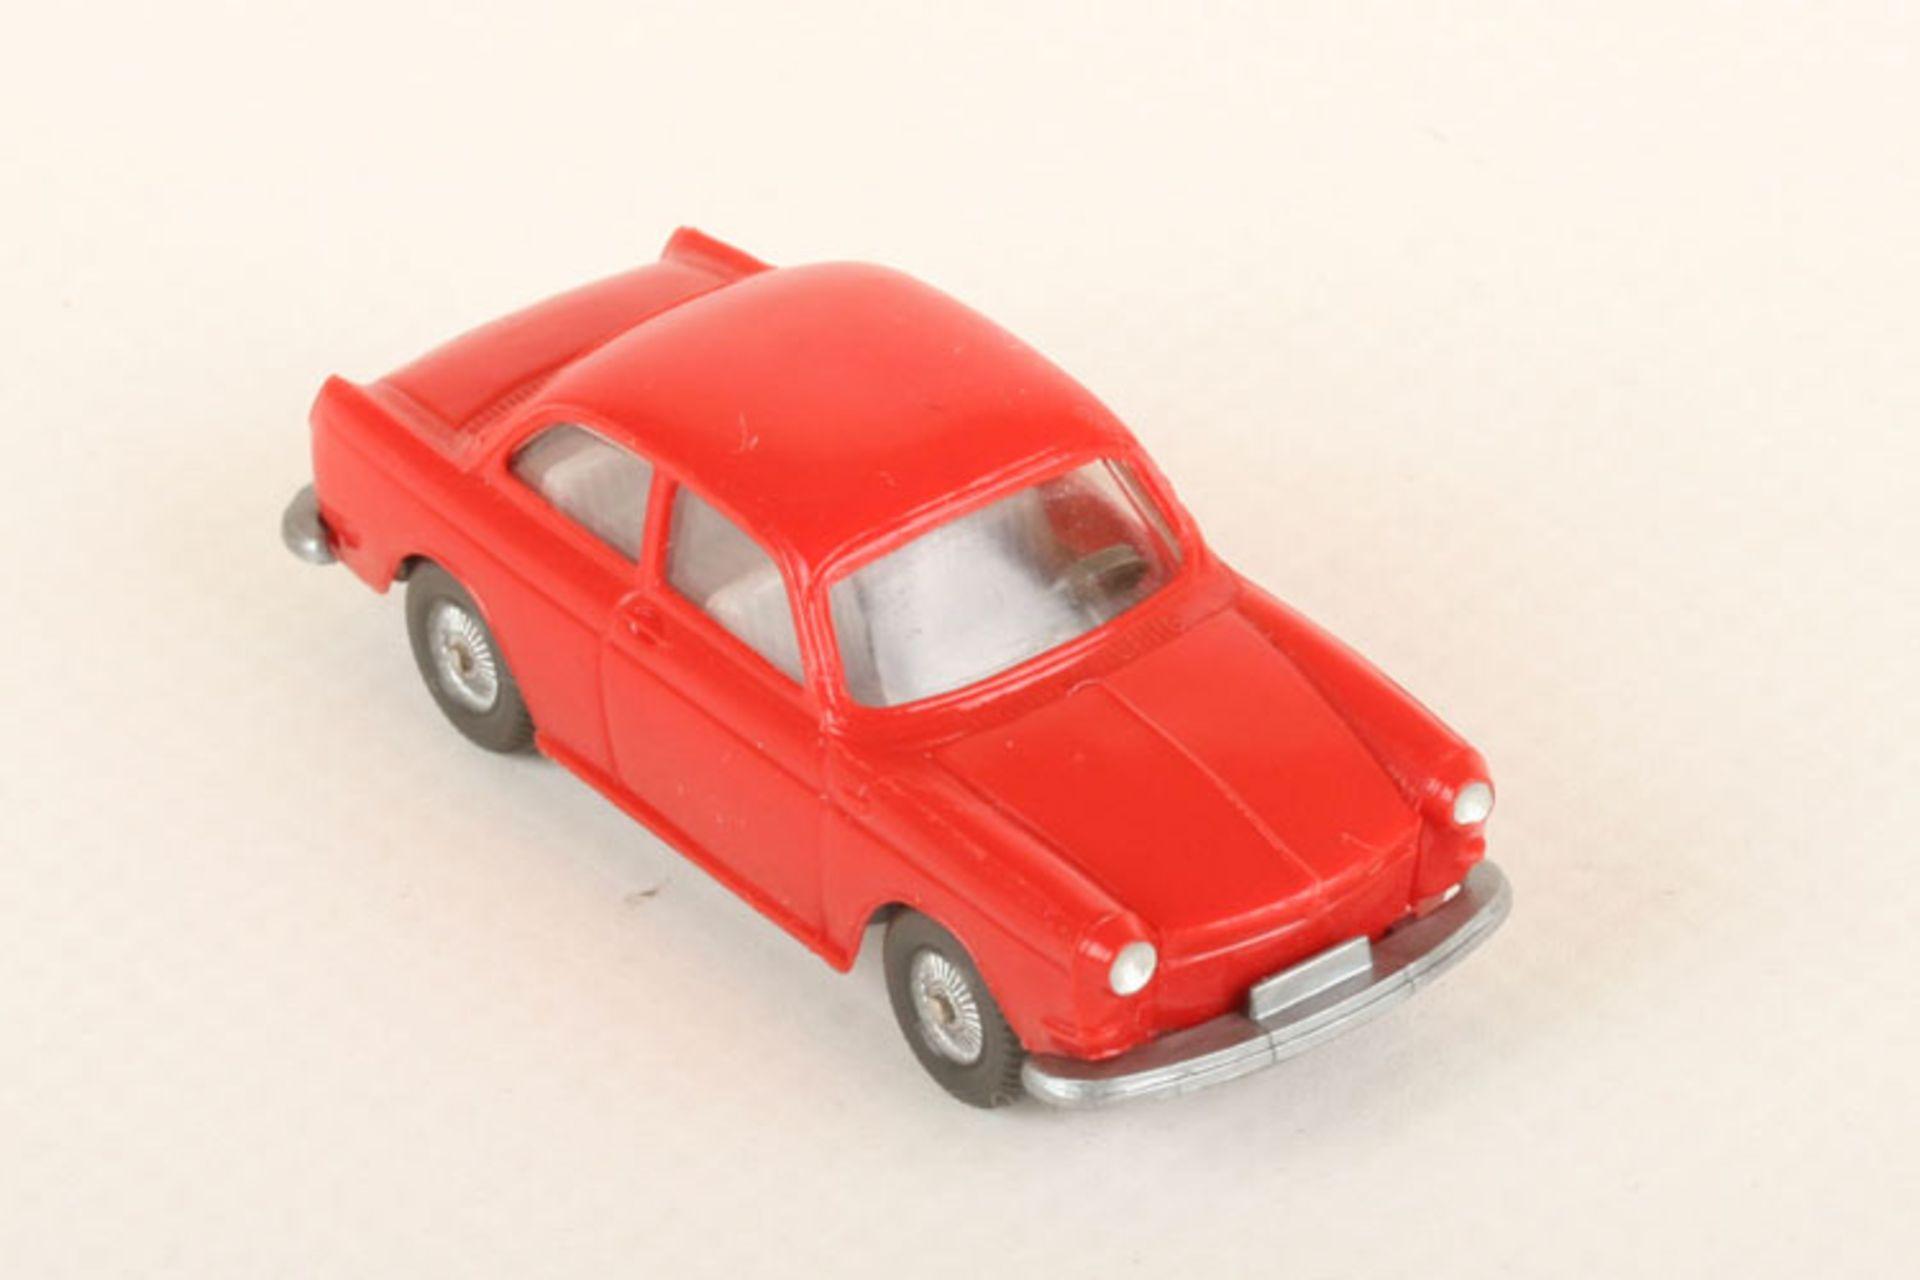 Los 1038 - Wiking VW 1600 rot 40/15c, neuwertig